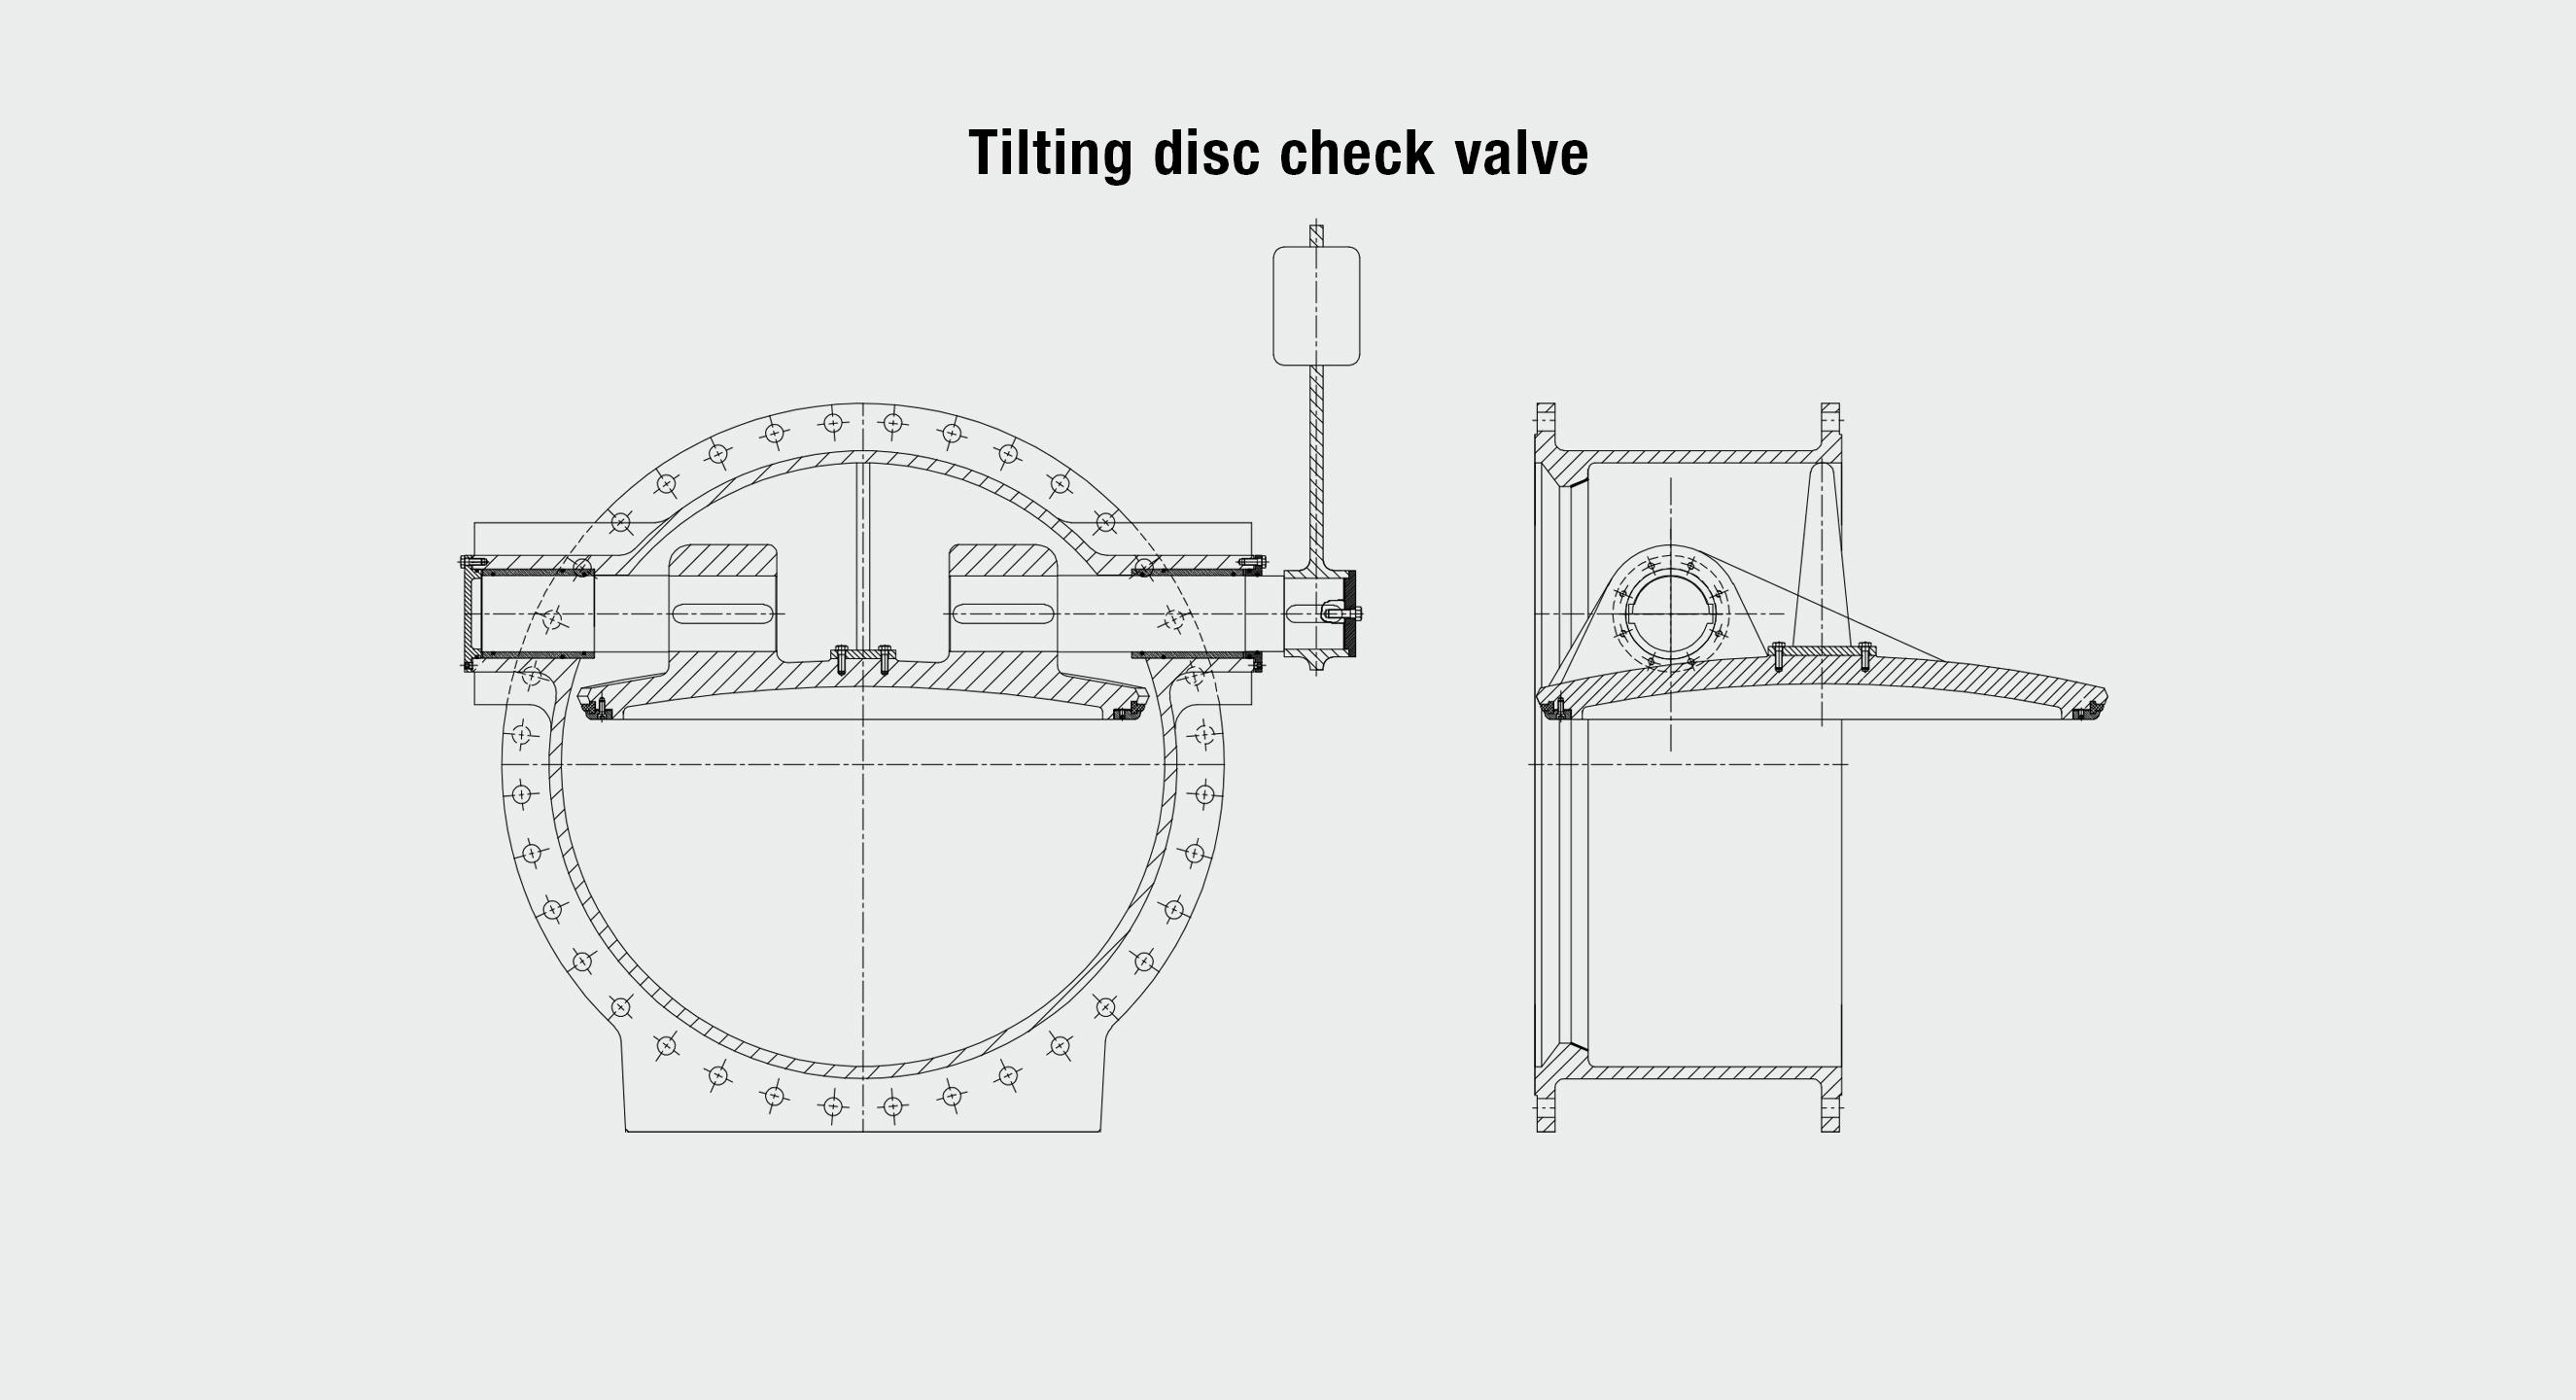 AVK tilting disc check valve drawings